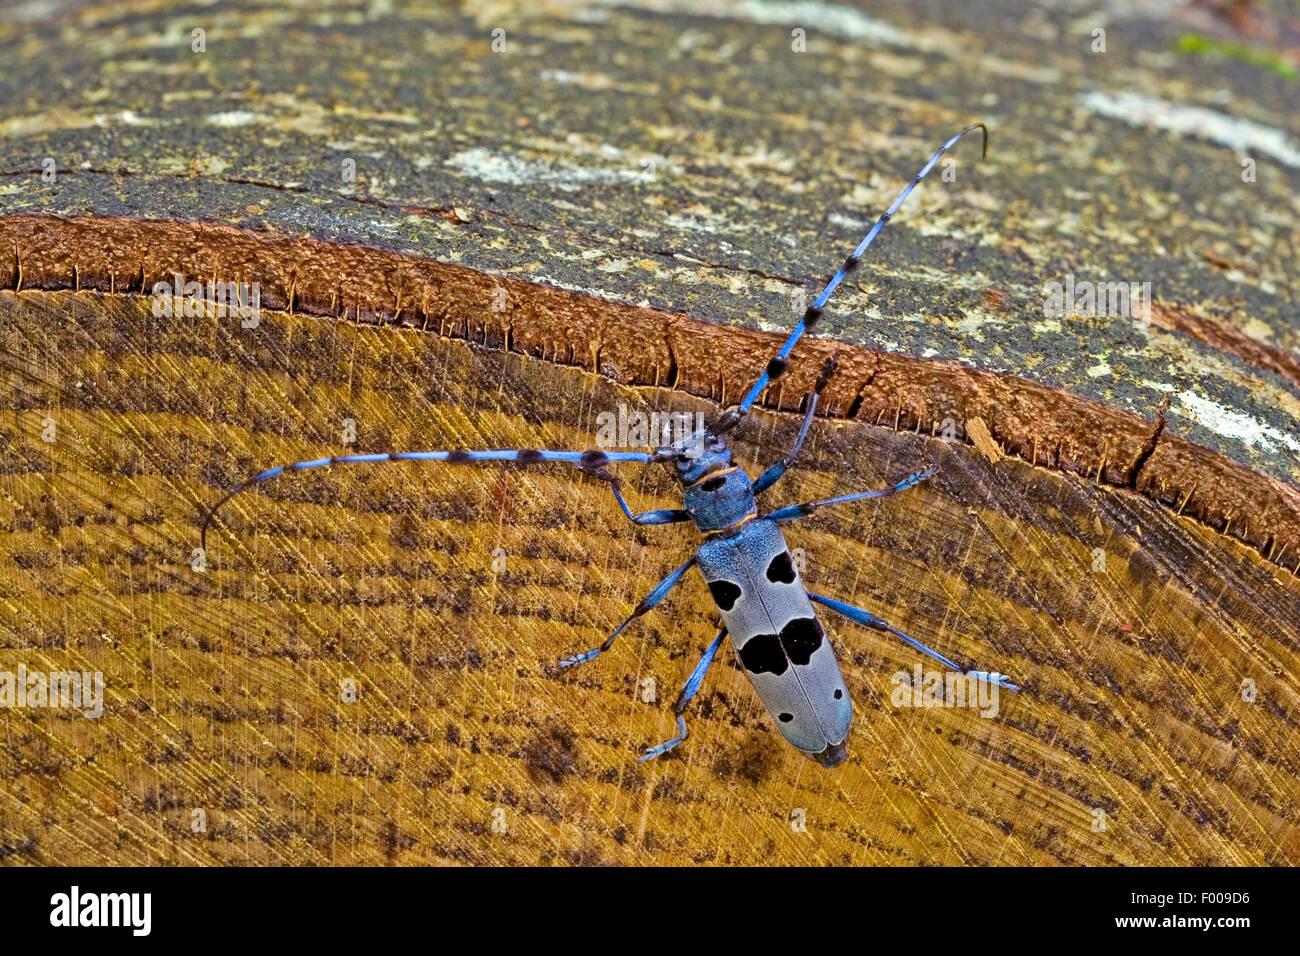 Rosalia longicorn (Rosalia alpina), male at log, Germany - Stock Image